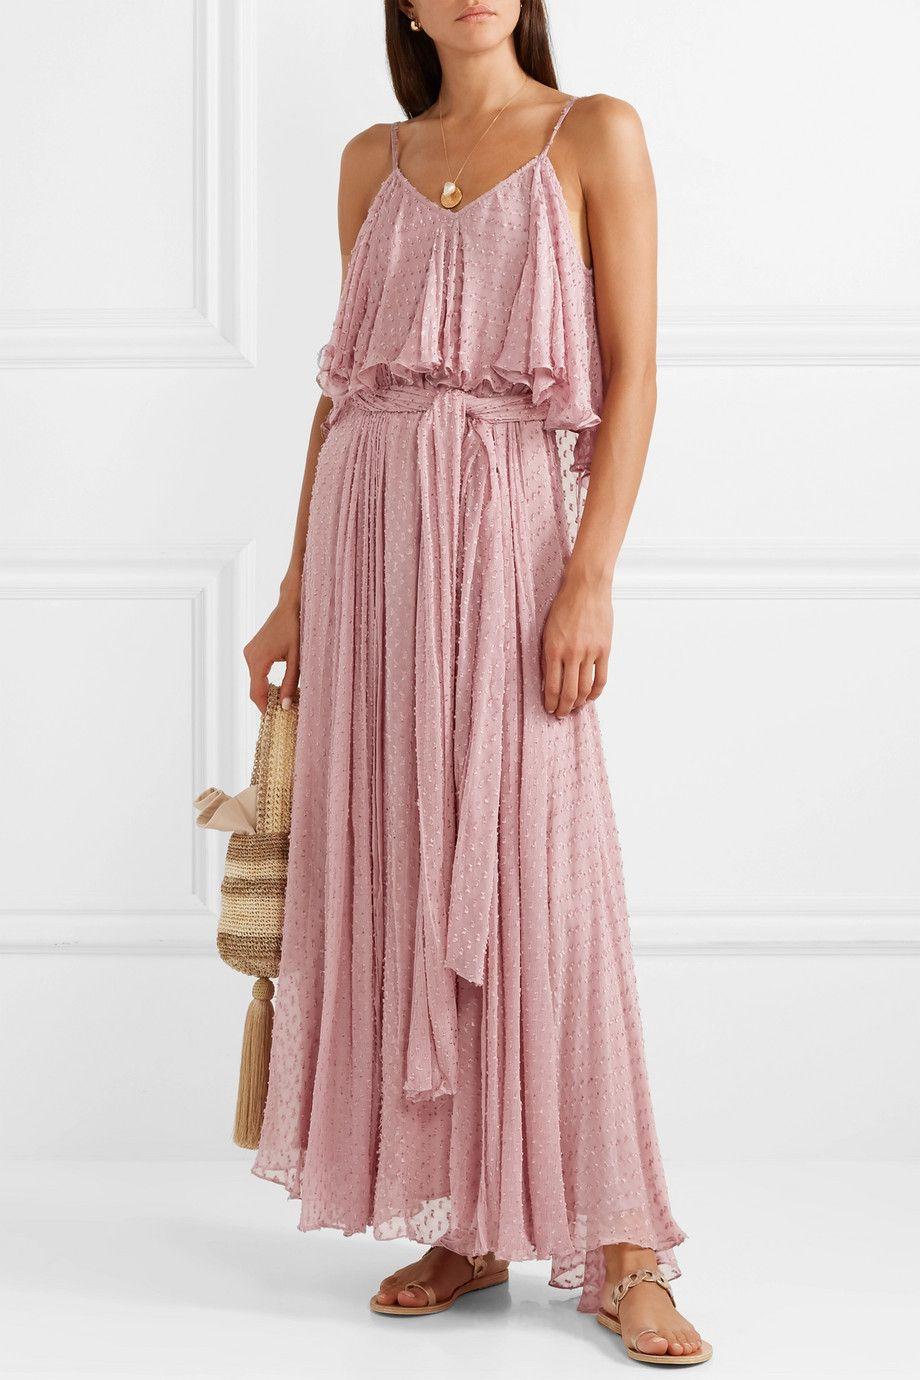 Mes Demoiselles Donatella Fil Coupe Georgette Maxi Dress Net A Porter Com Gauze Maxi Dress Maxi Dress Maxi Dress Sale [ 1380 x 920 Pixel ]